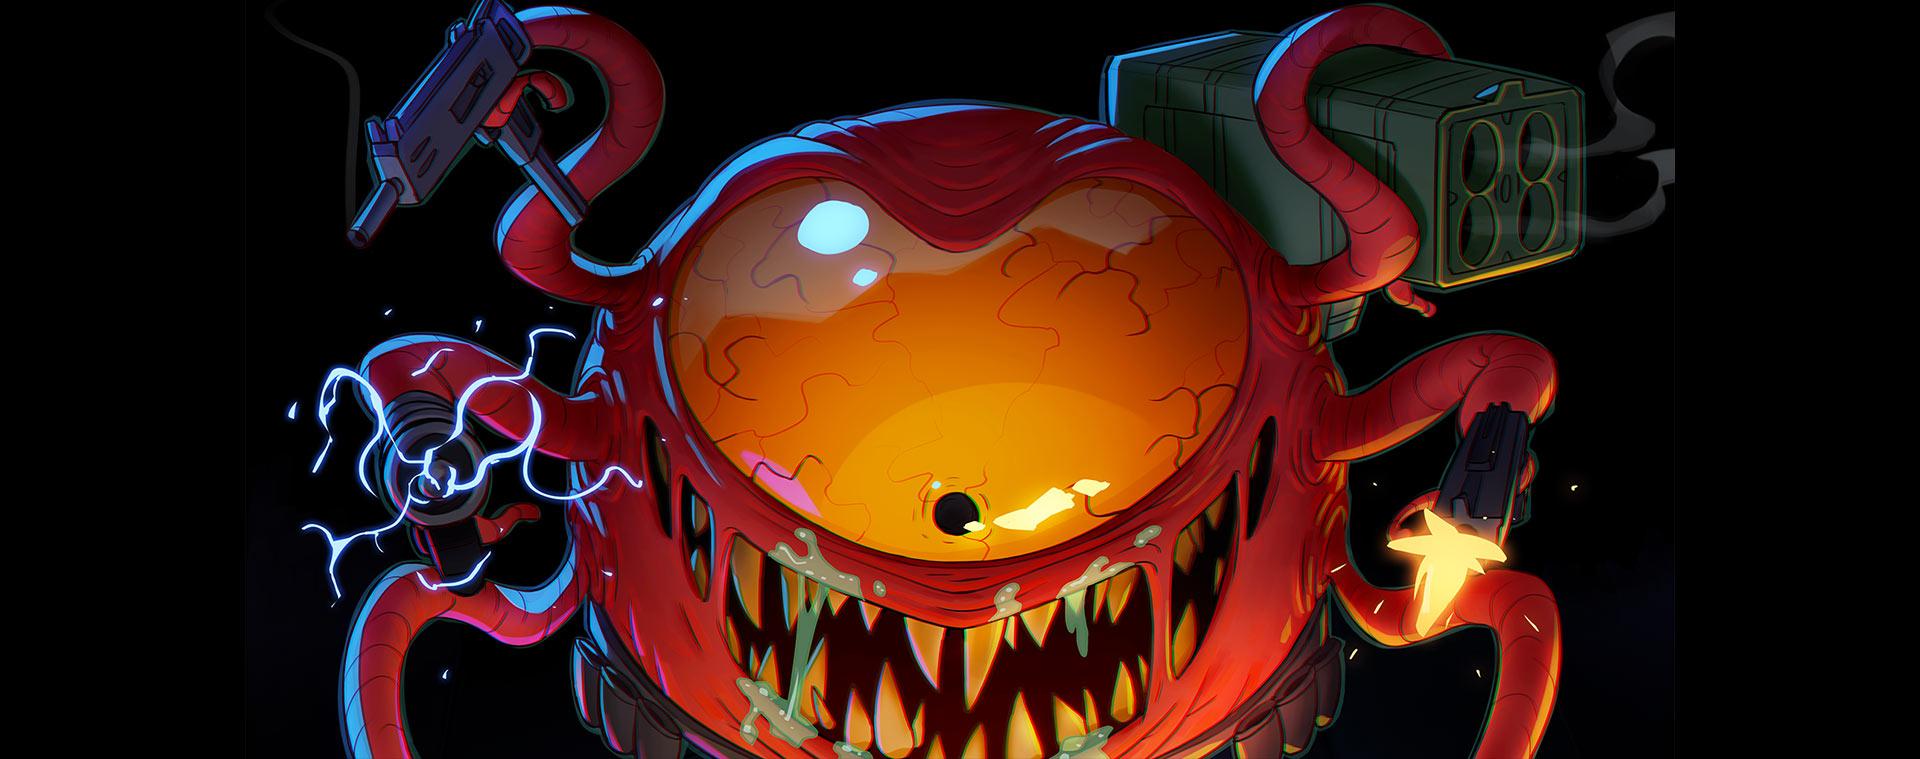 Enter the Gungeon, Gods Trigger free on Epic Games Store, Hitman coming next week thumbnail